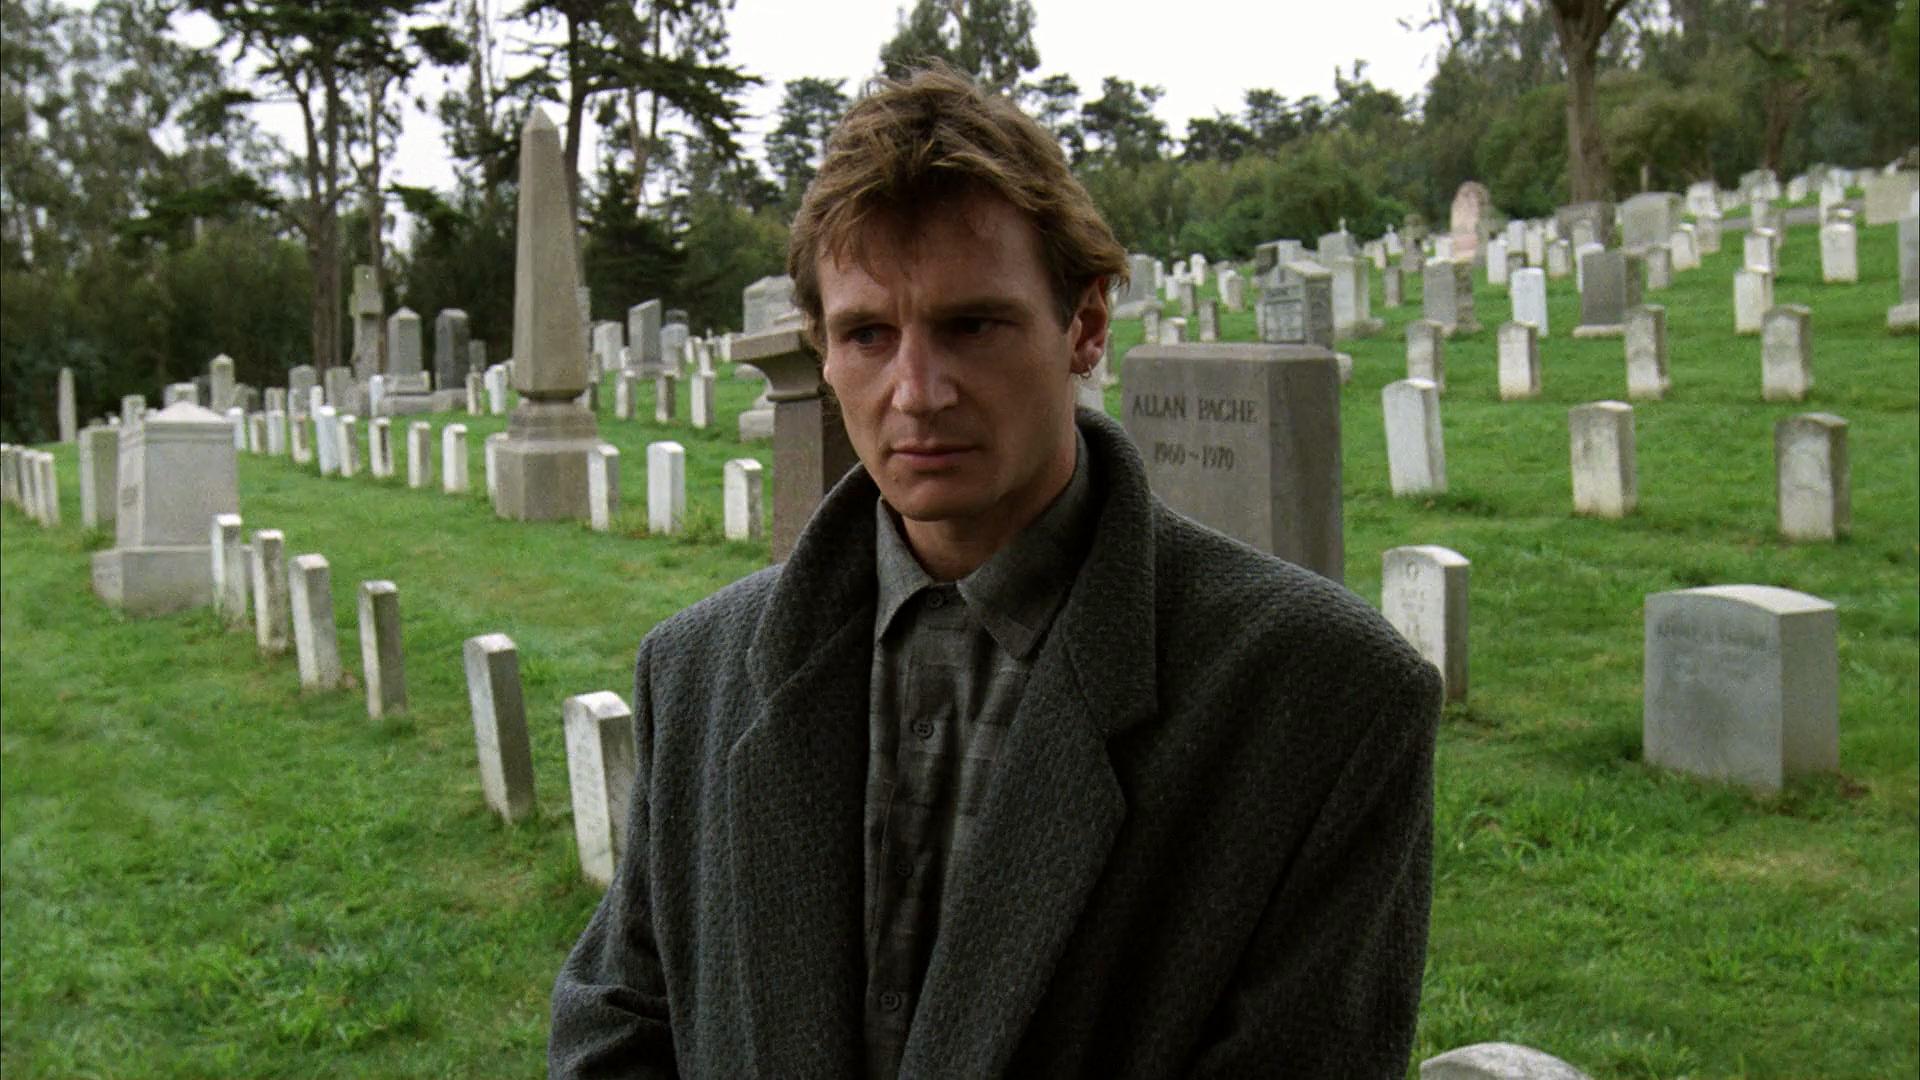 Liam Neeson in The Dead Pool (1988)